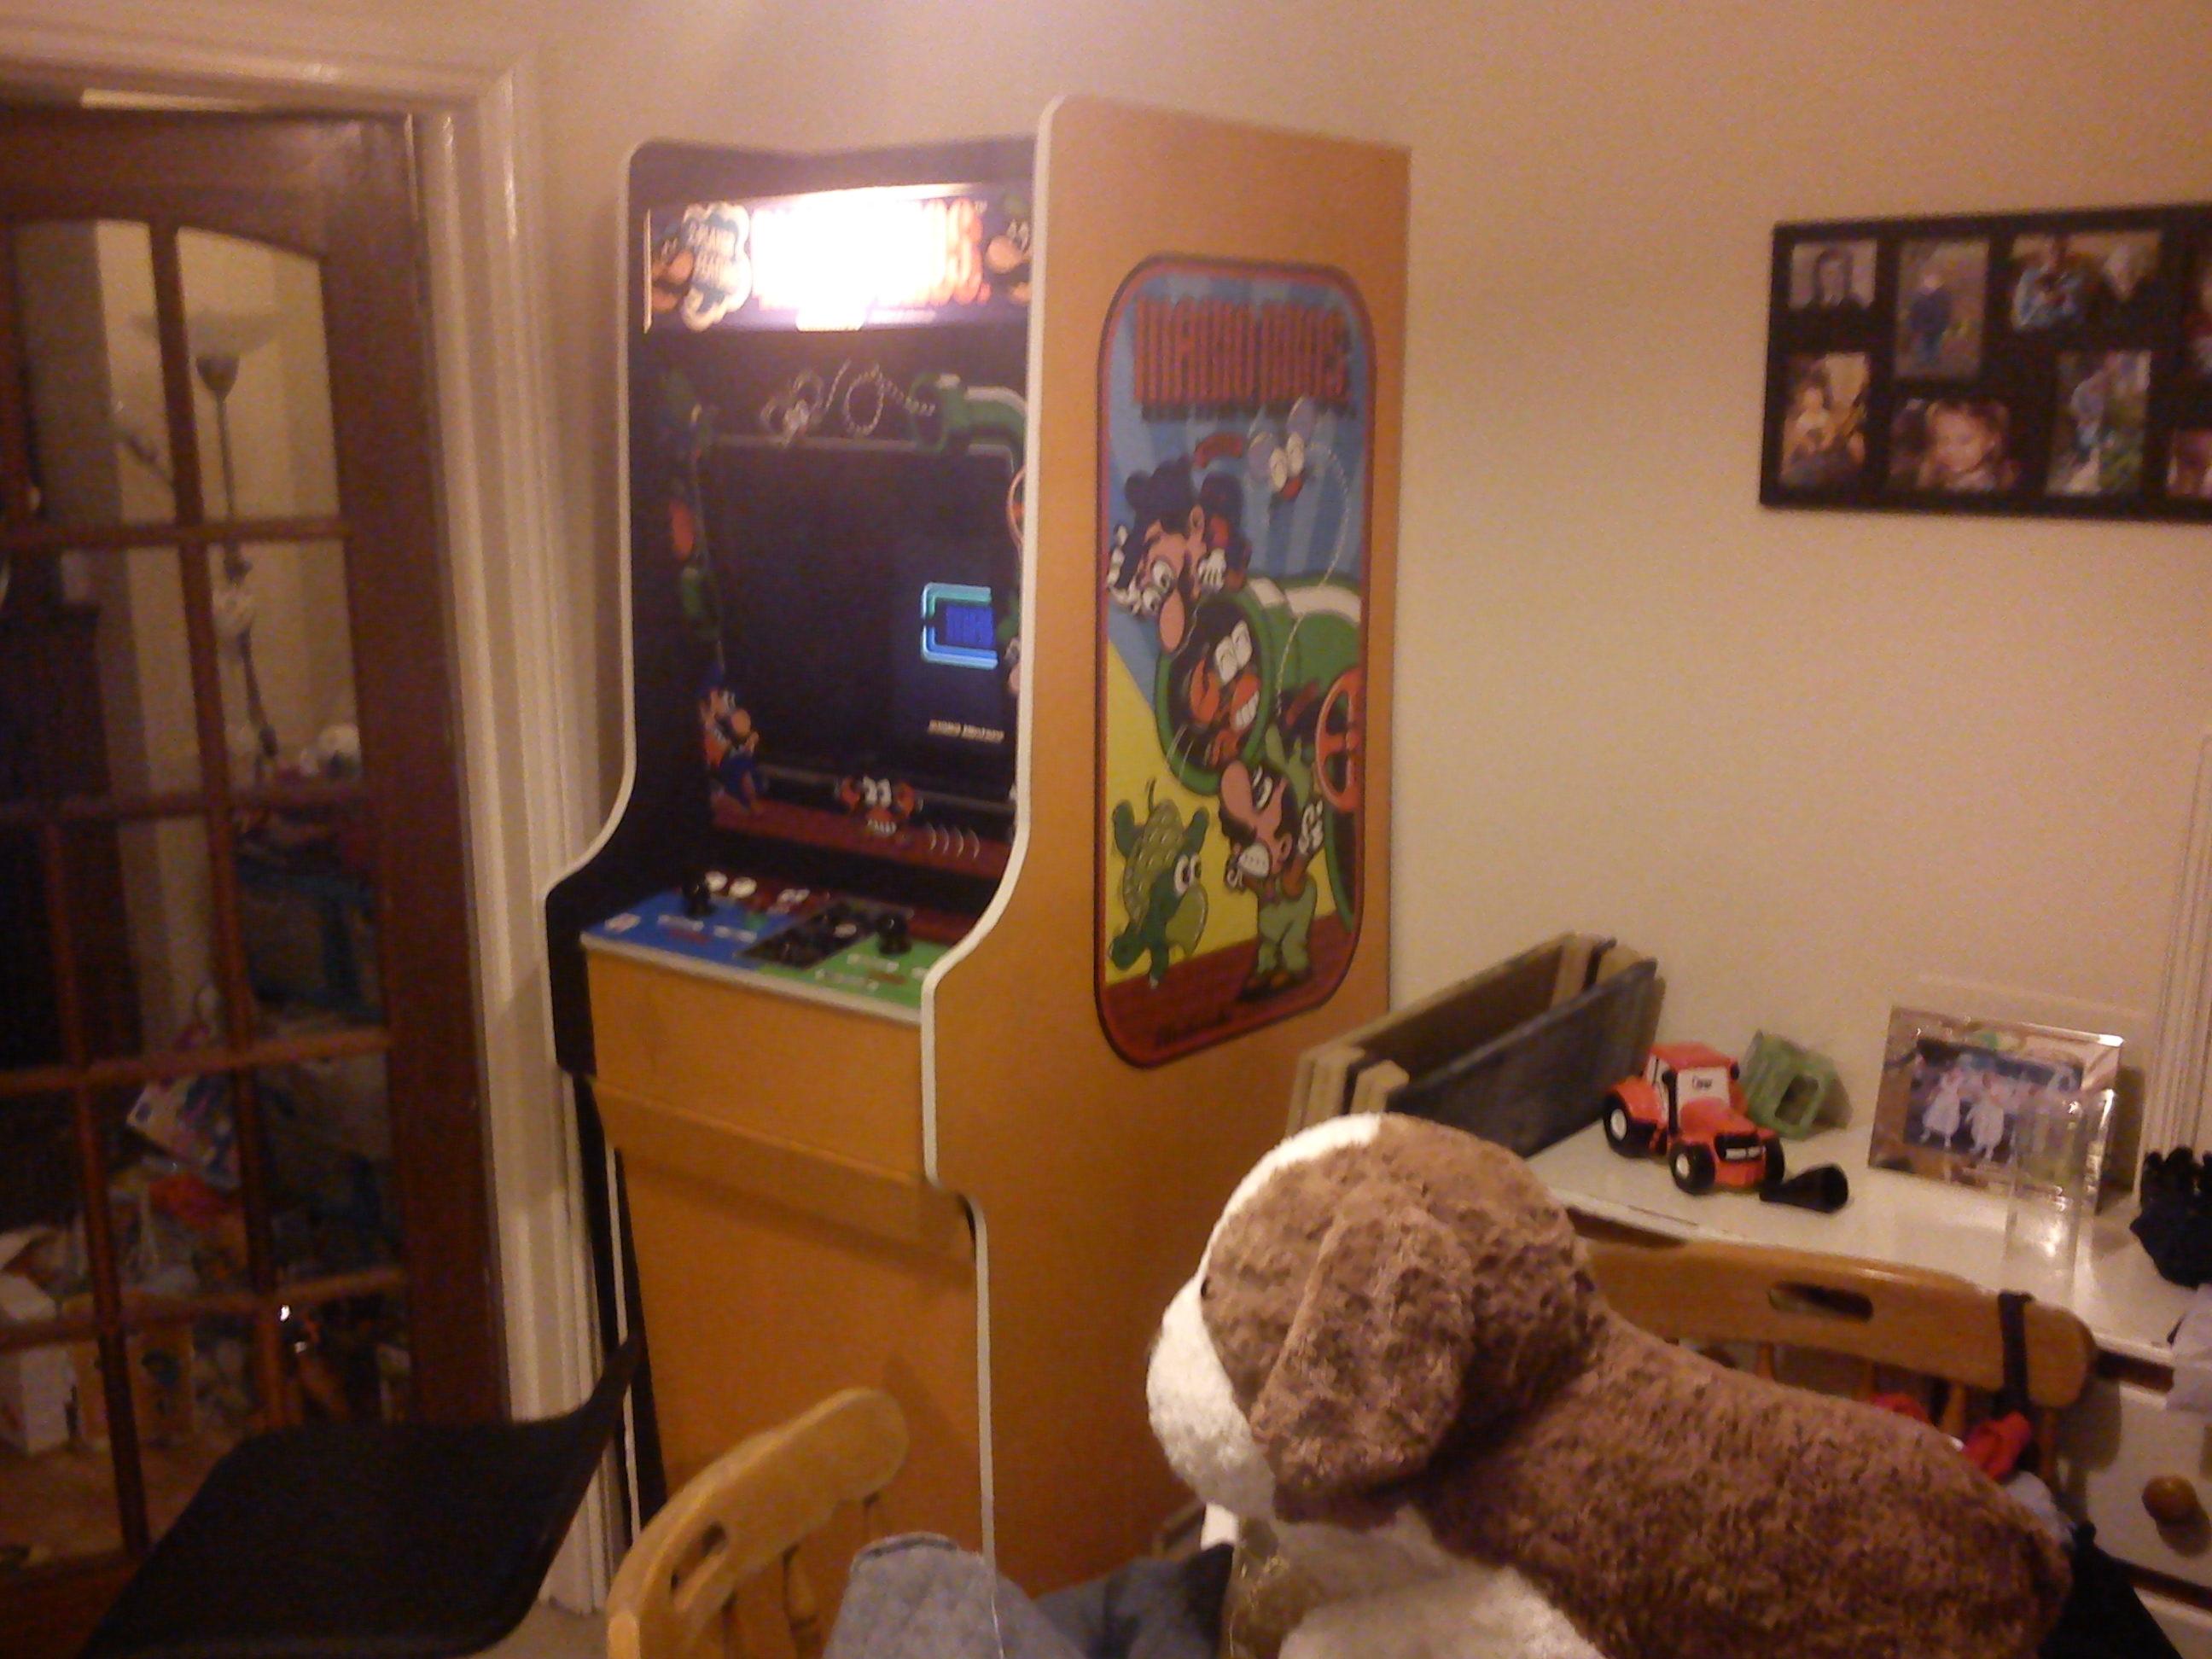 Fr0st: Mario Bros (Arcade Emulated / M.A.M.E.) 69,430 points on 2014-10-24 03:20:20